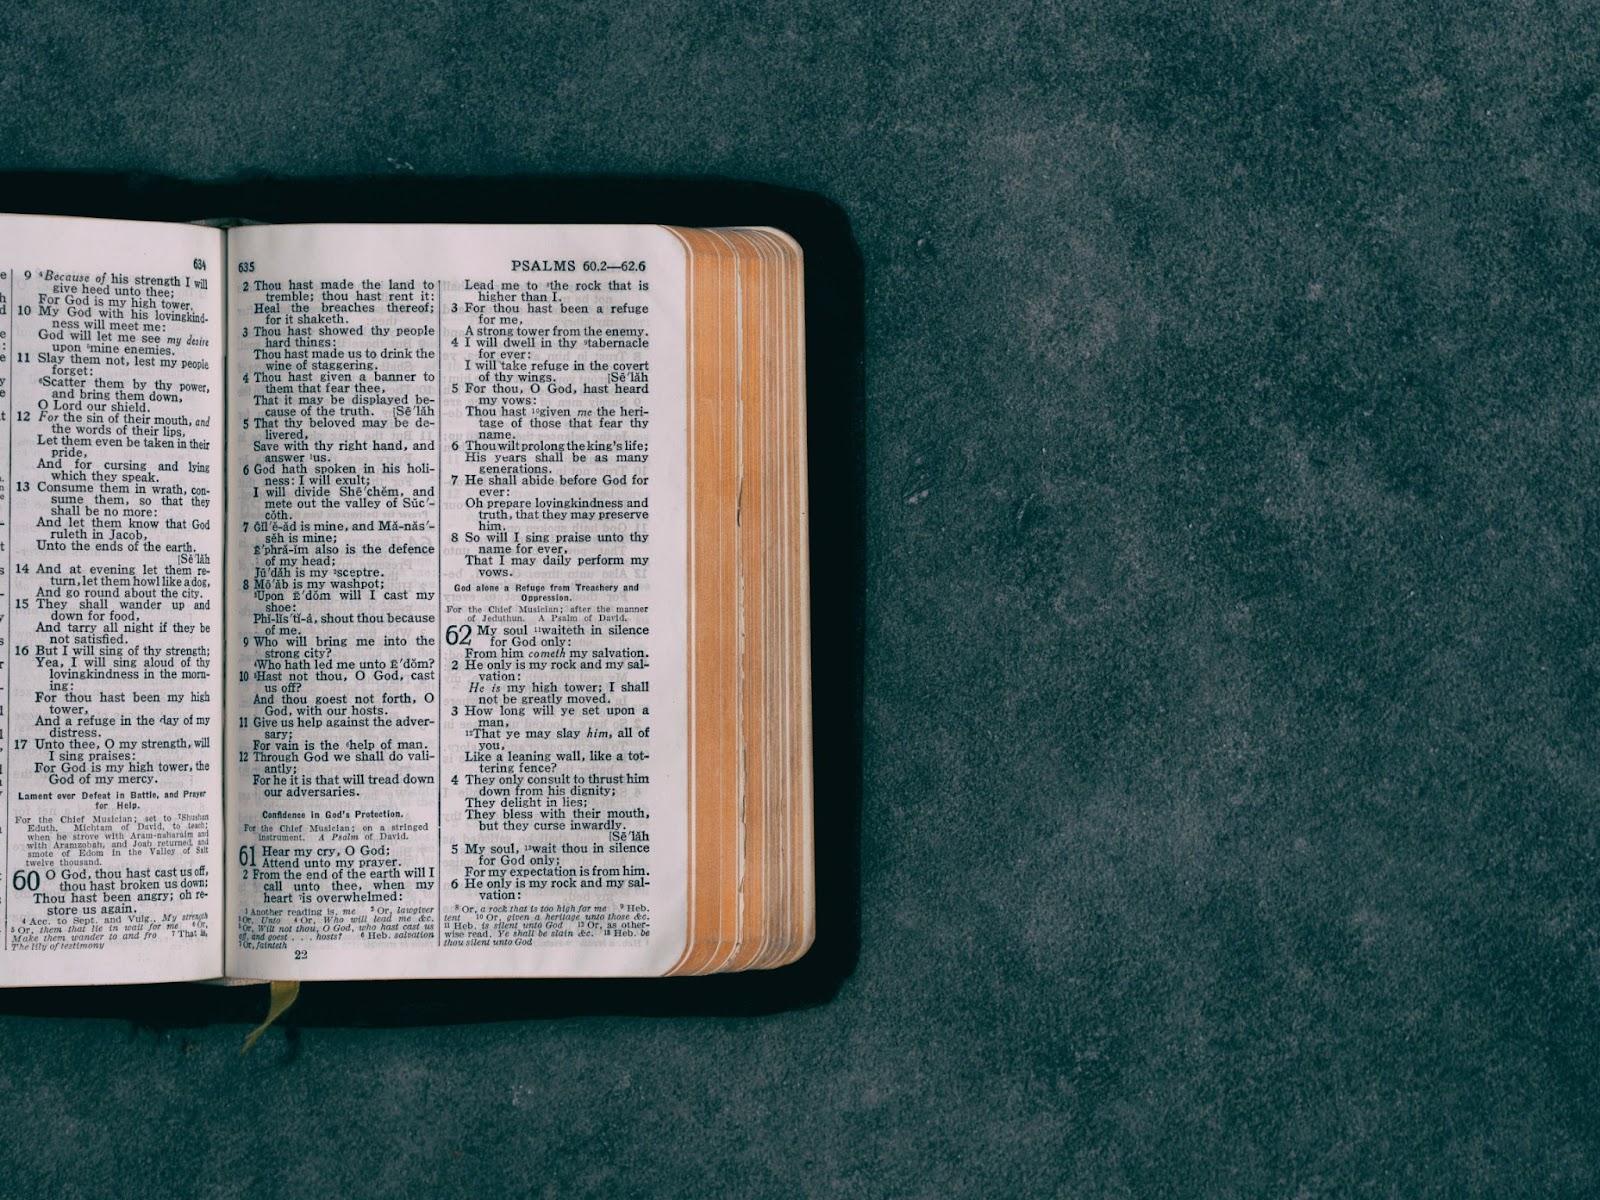 Open scriptures against a dark green background